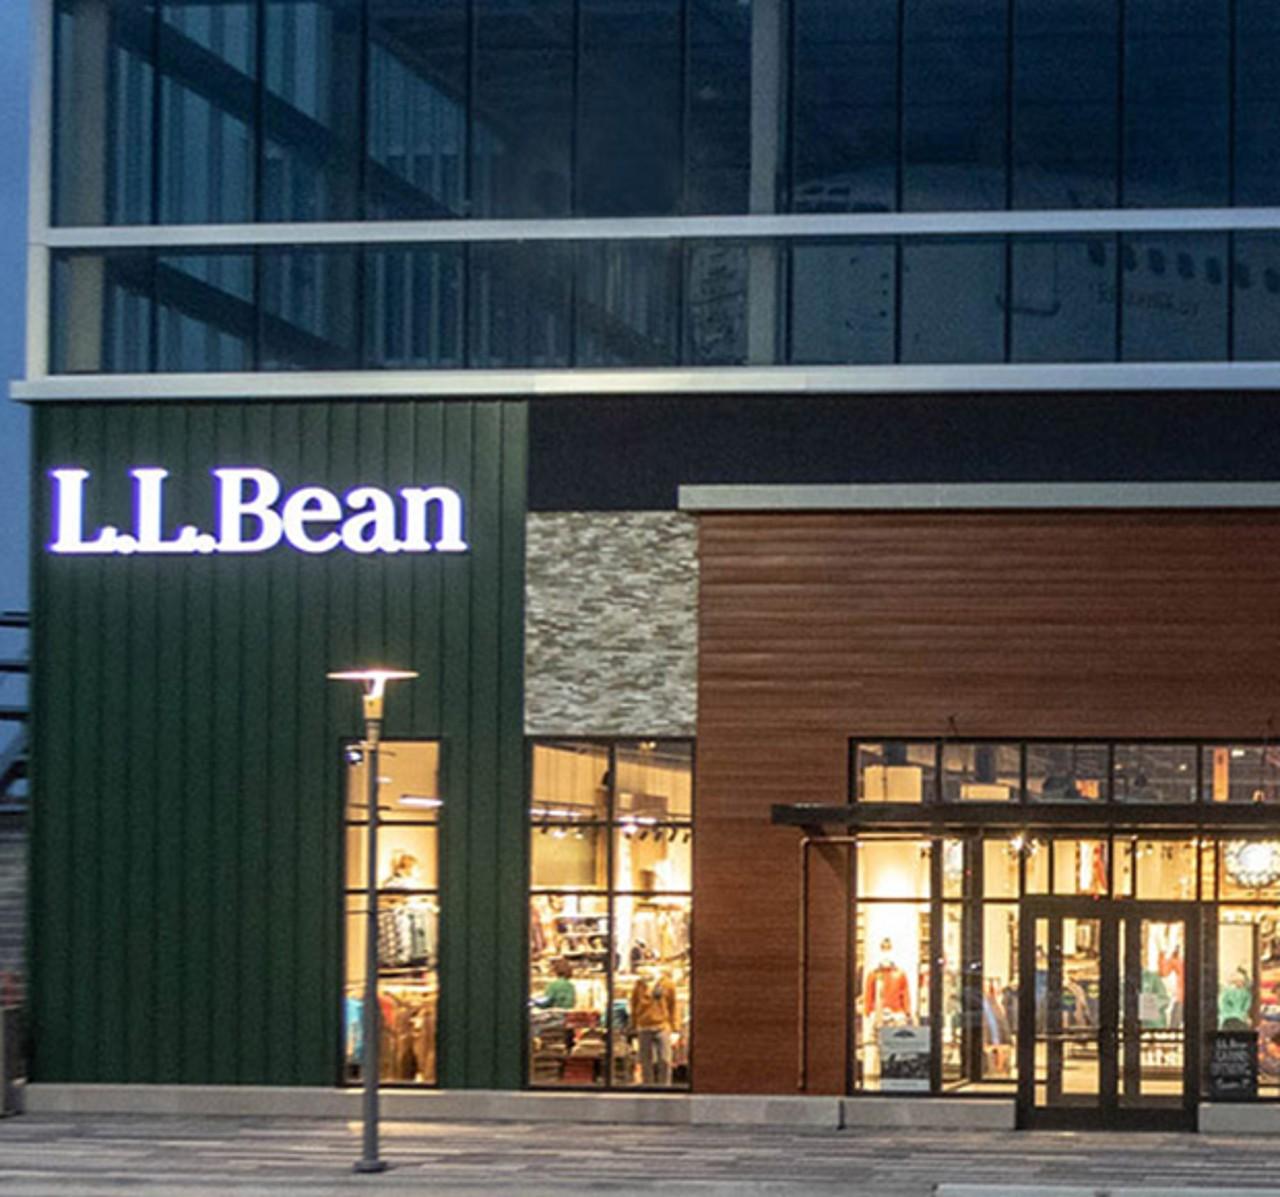 Oak Brook, IL L.L.Bean Reatil Store